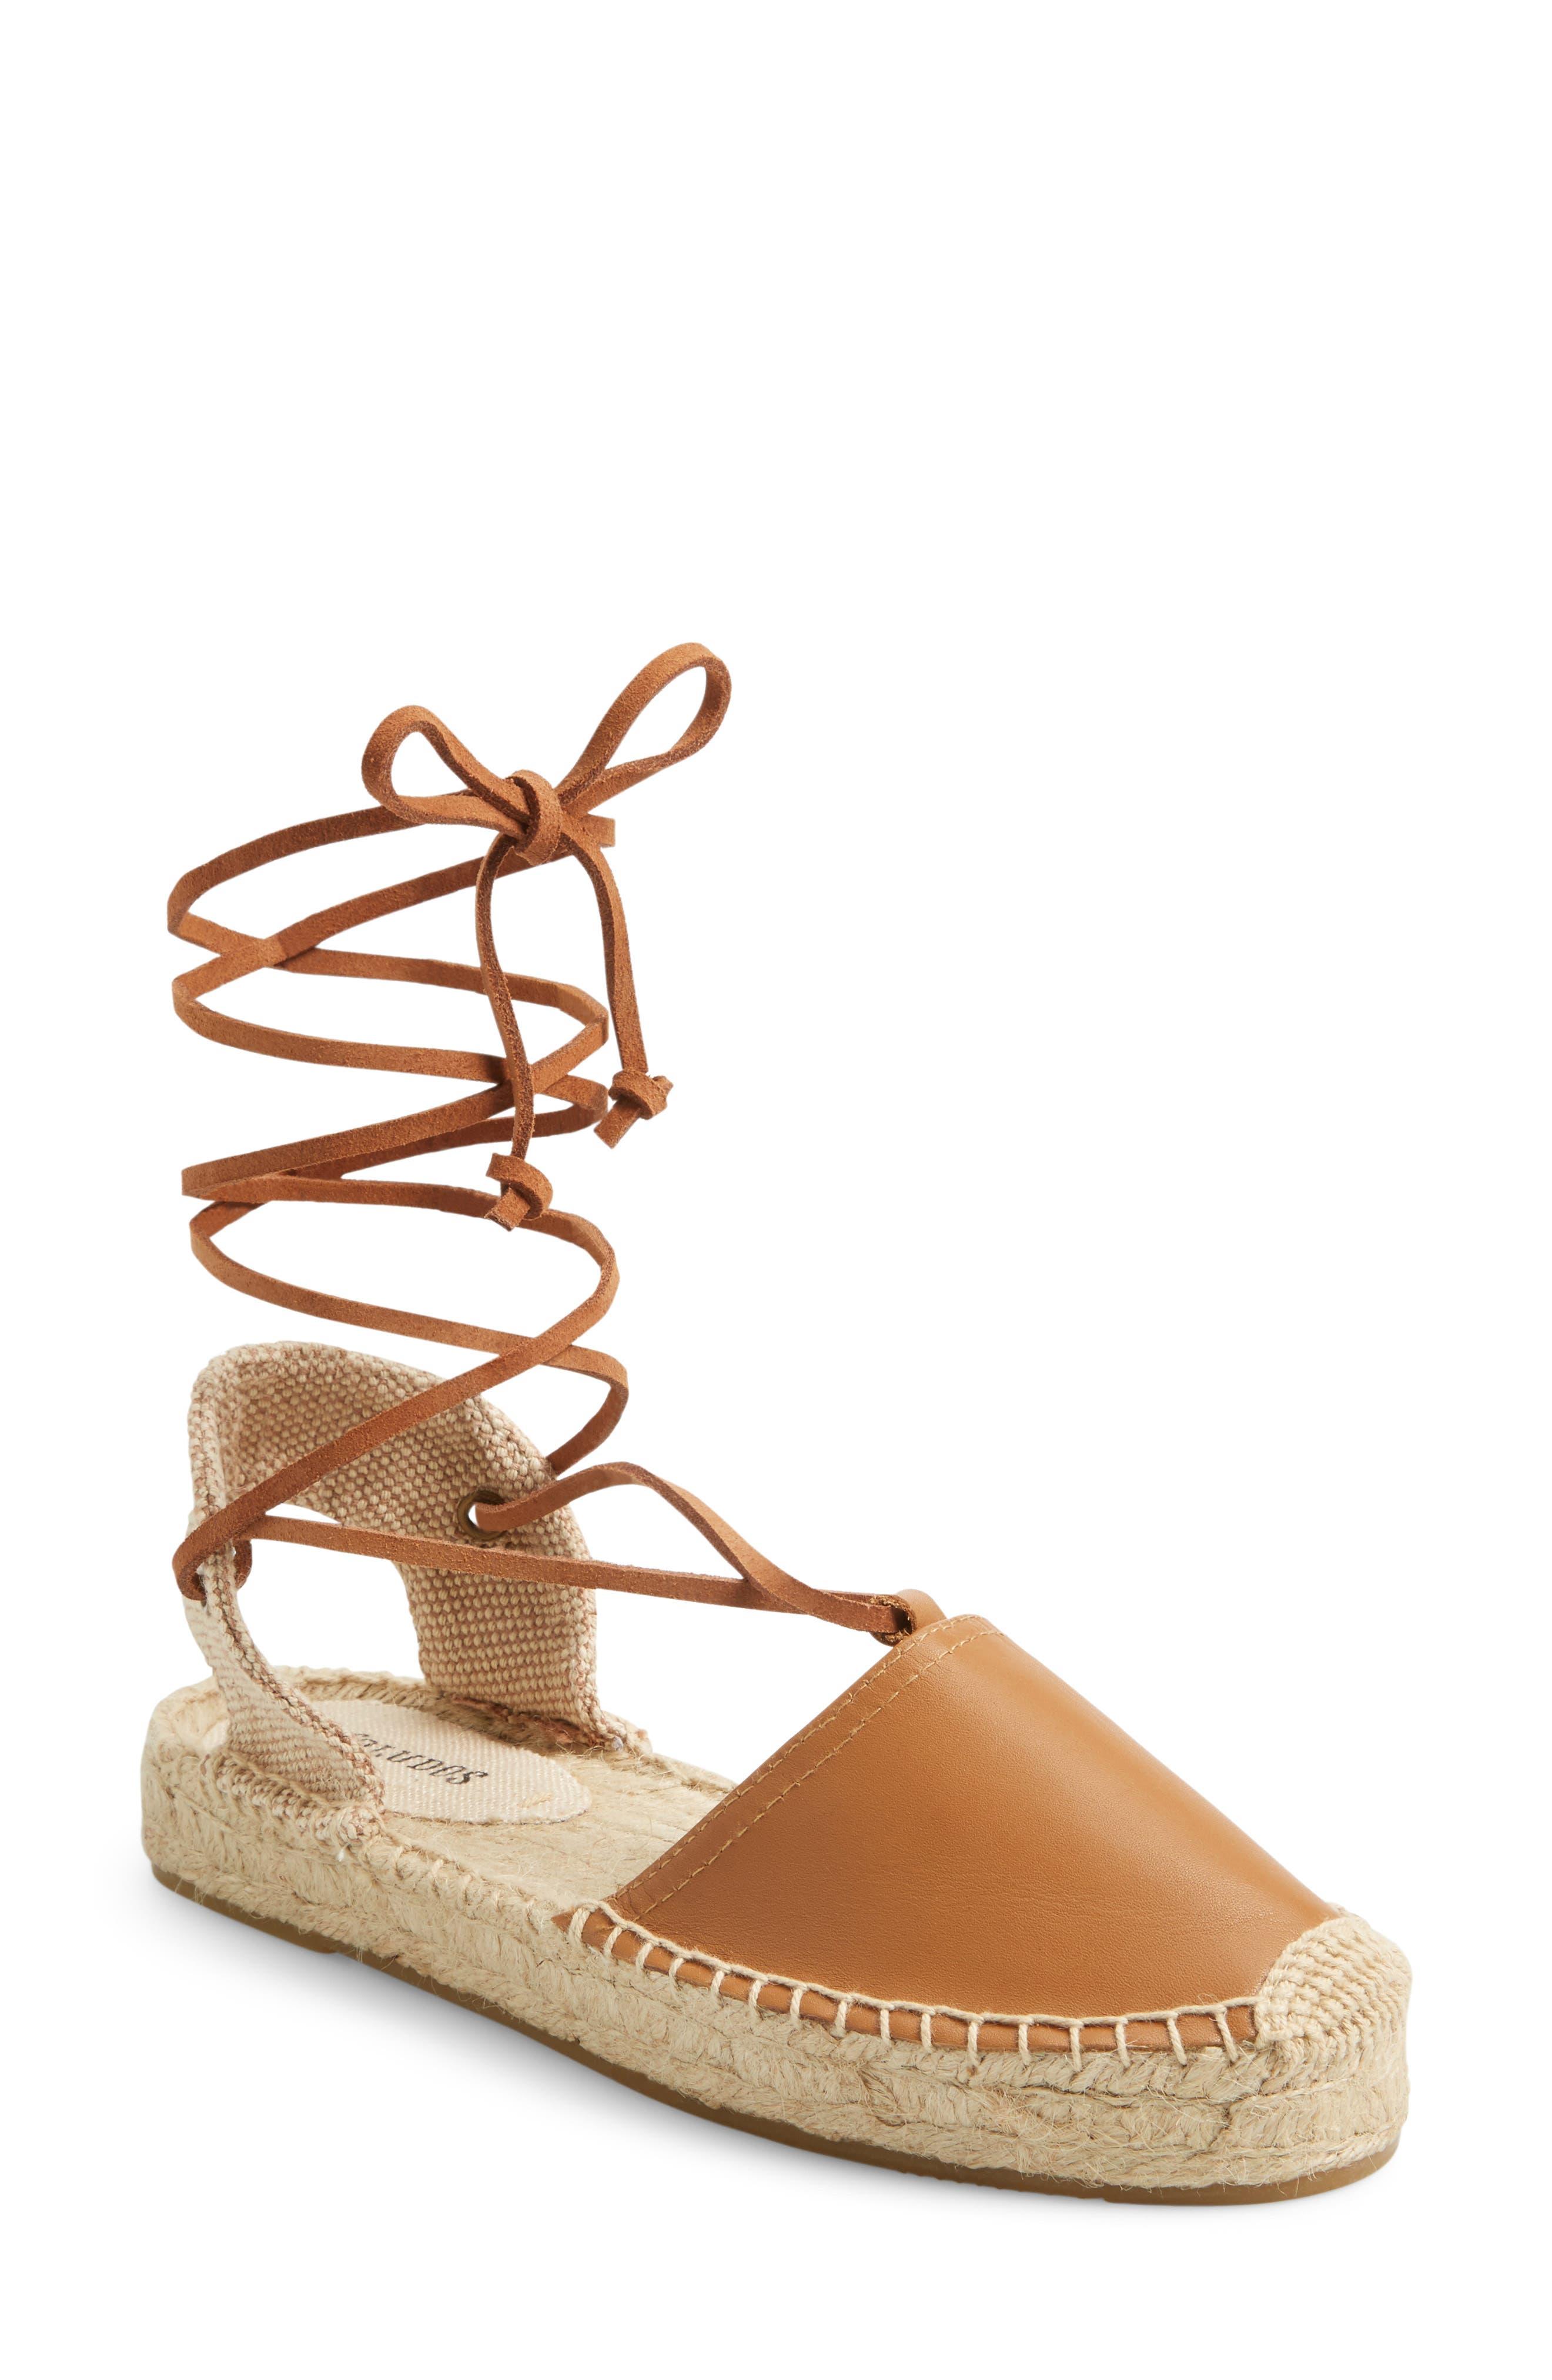 Alternate Image 1 Selected - Soludos Platform Sandal (Women)